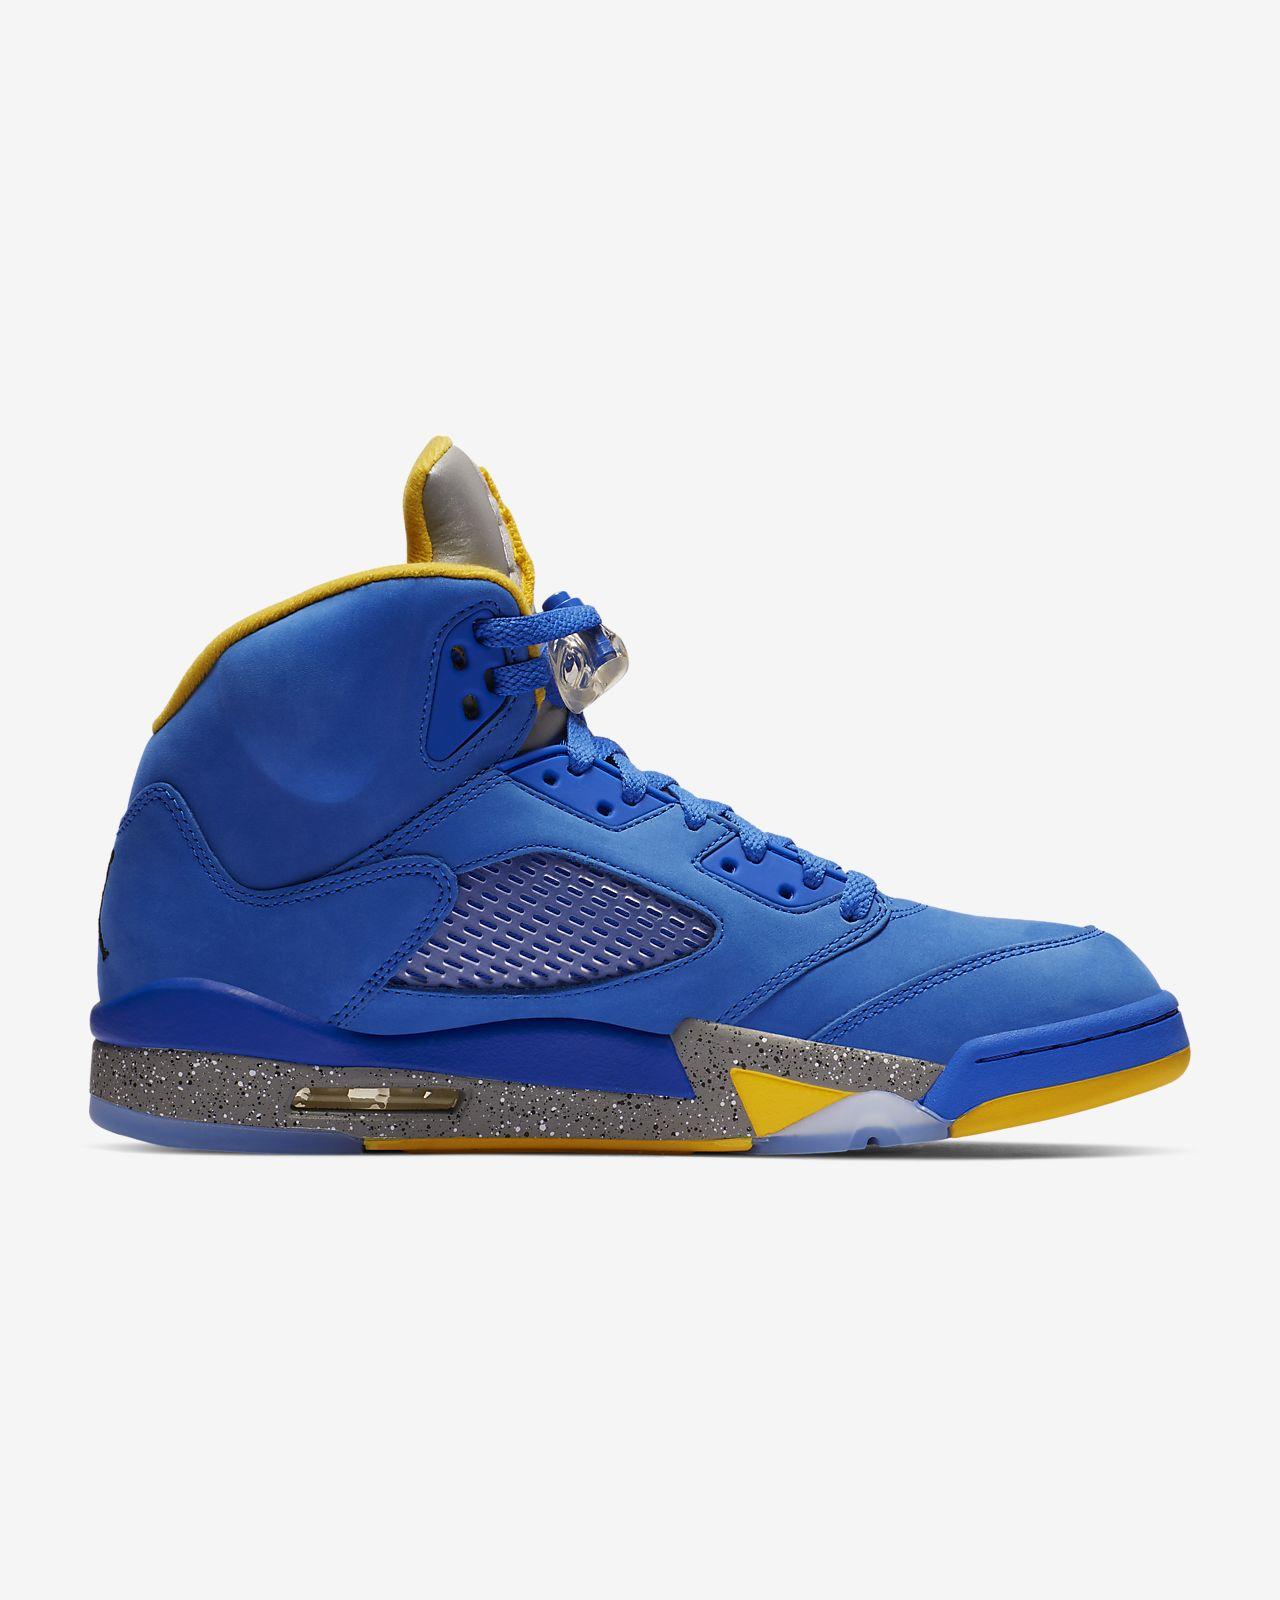 965c5c4986 Air Jordan 5 Laney JSP Zapatillas - Hombre. Nike.com ES